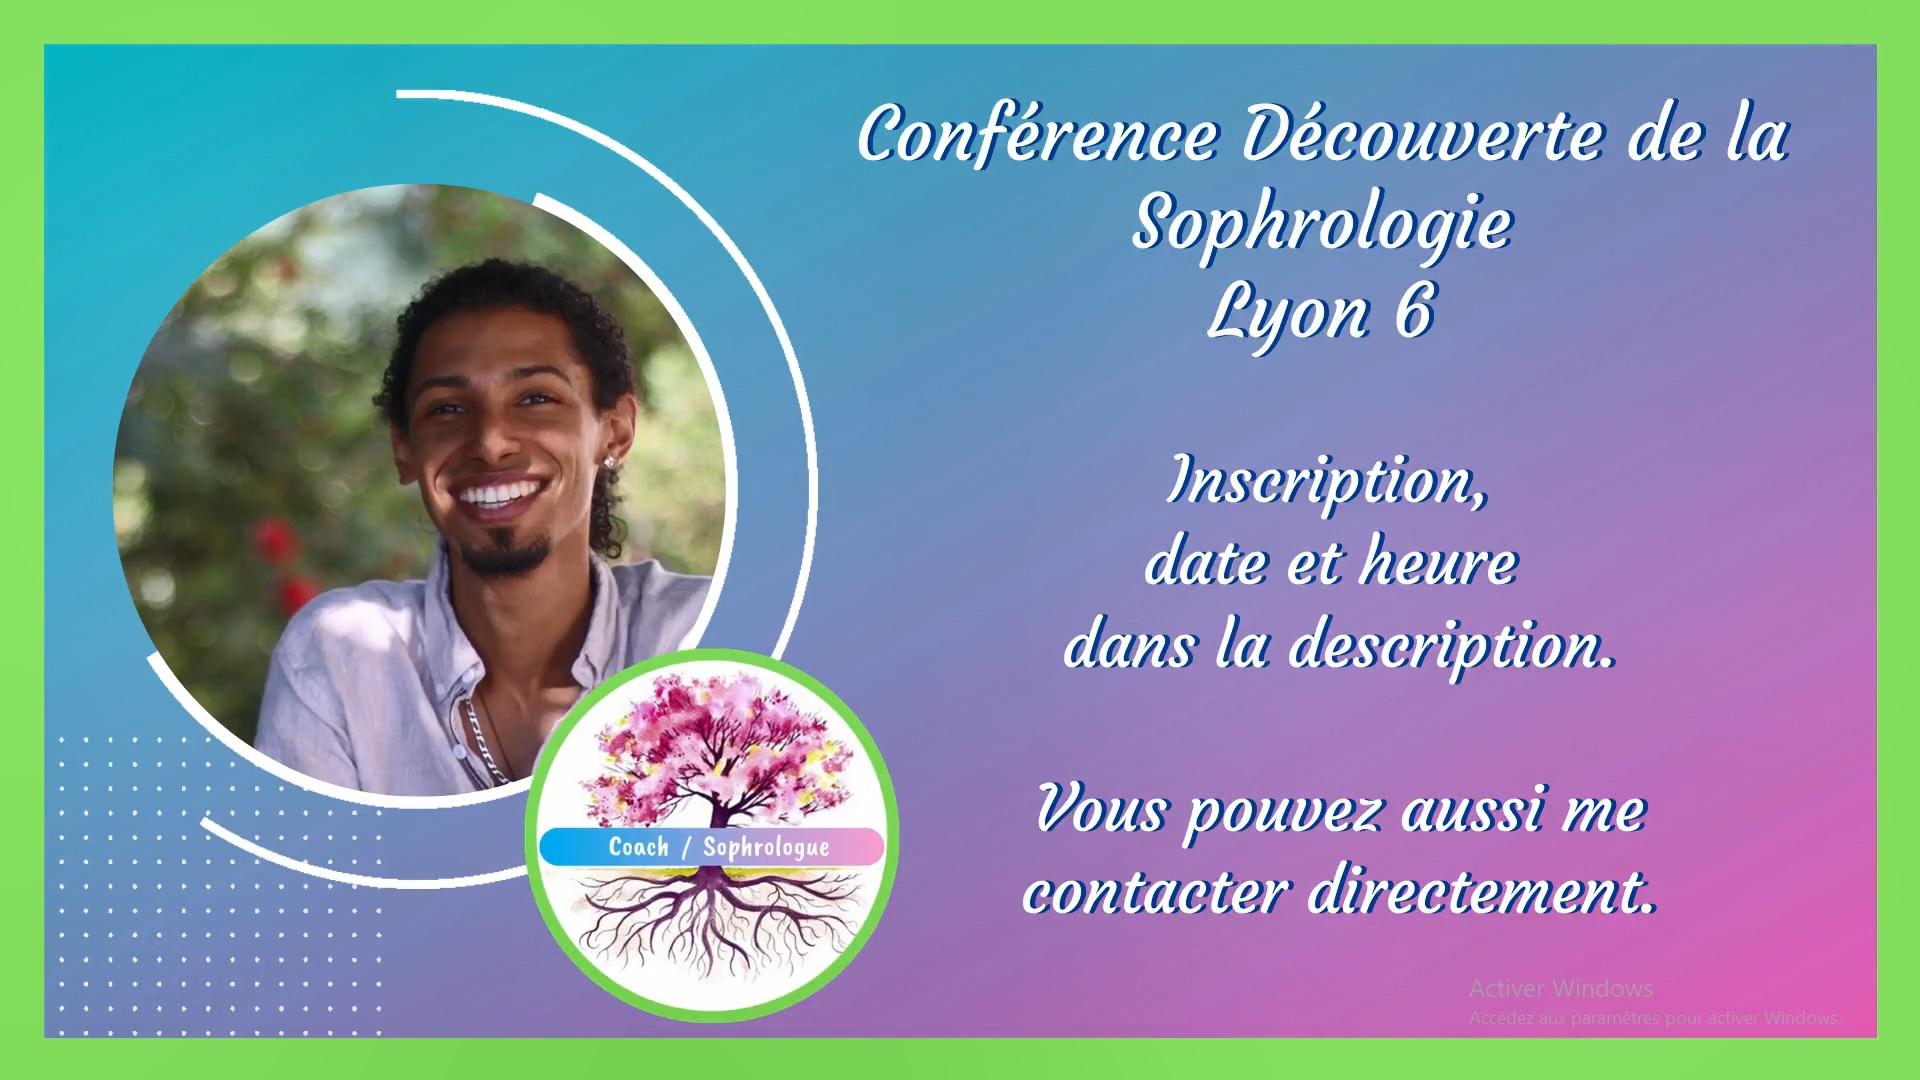 conférence de sophrologie lyon 6